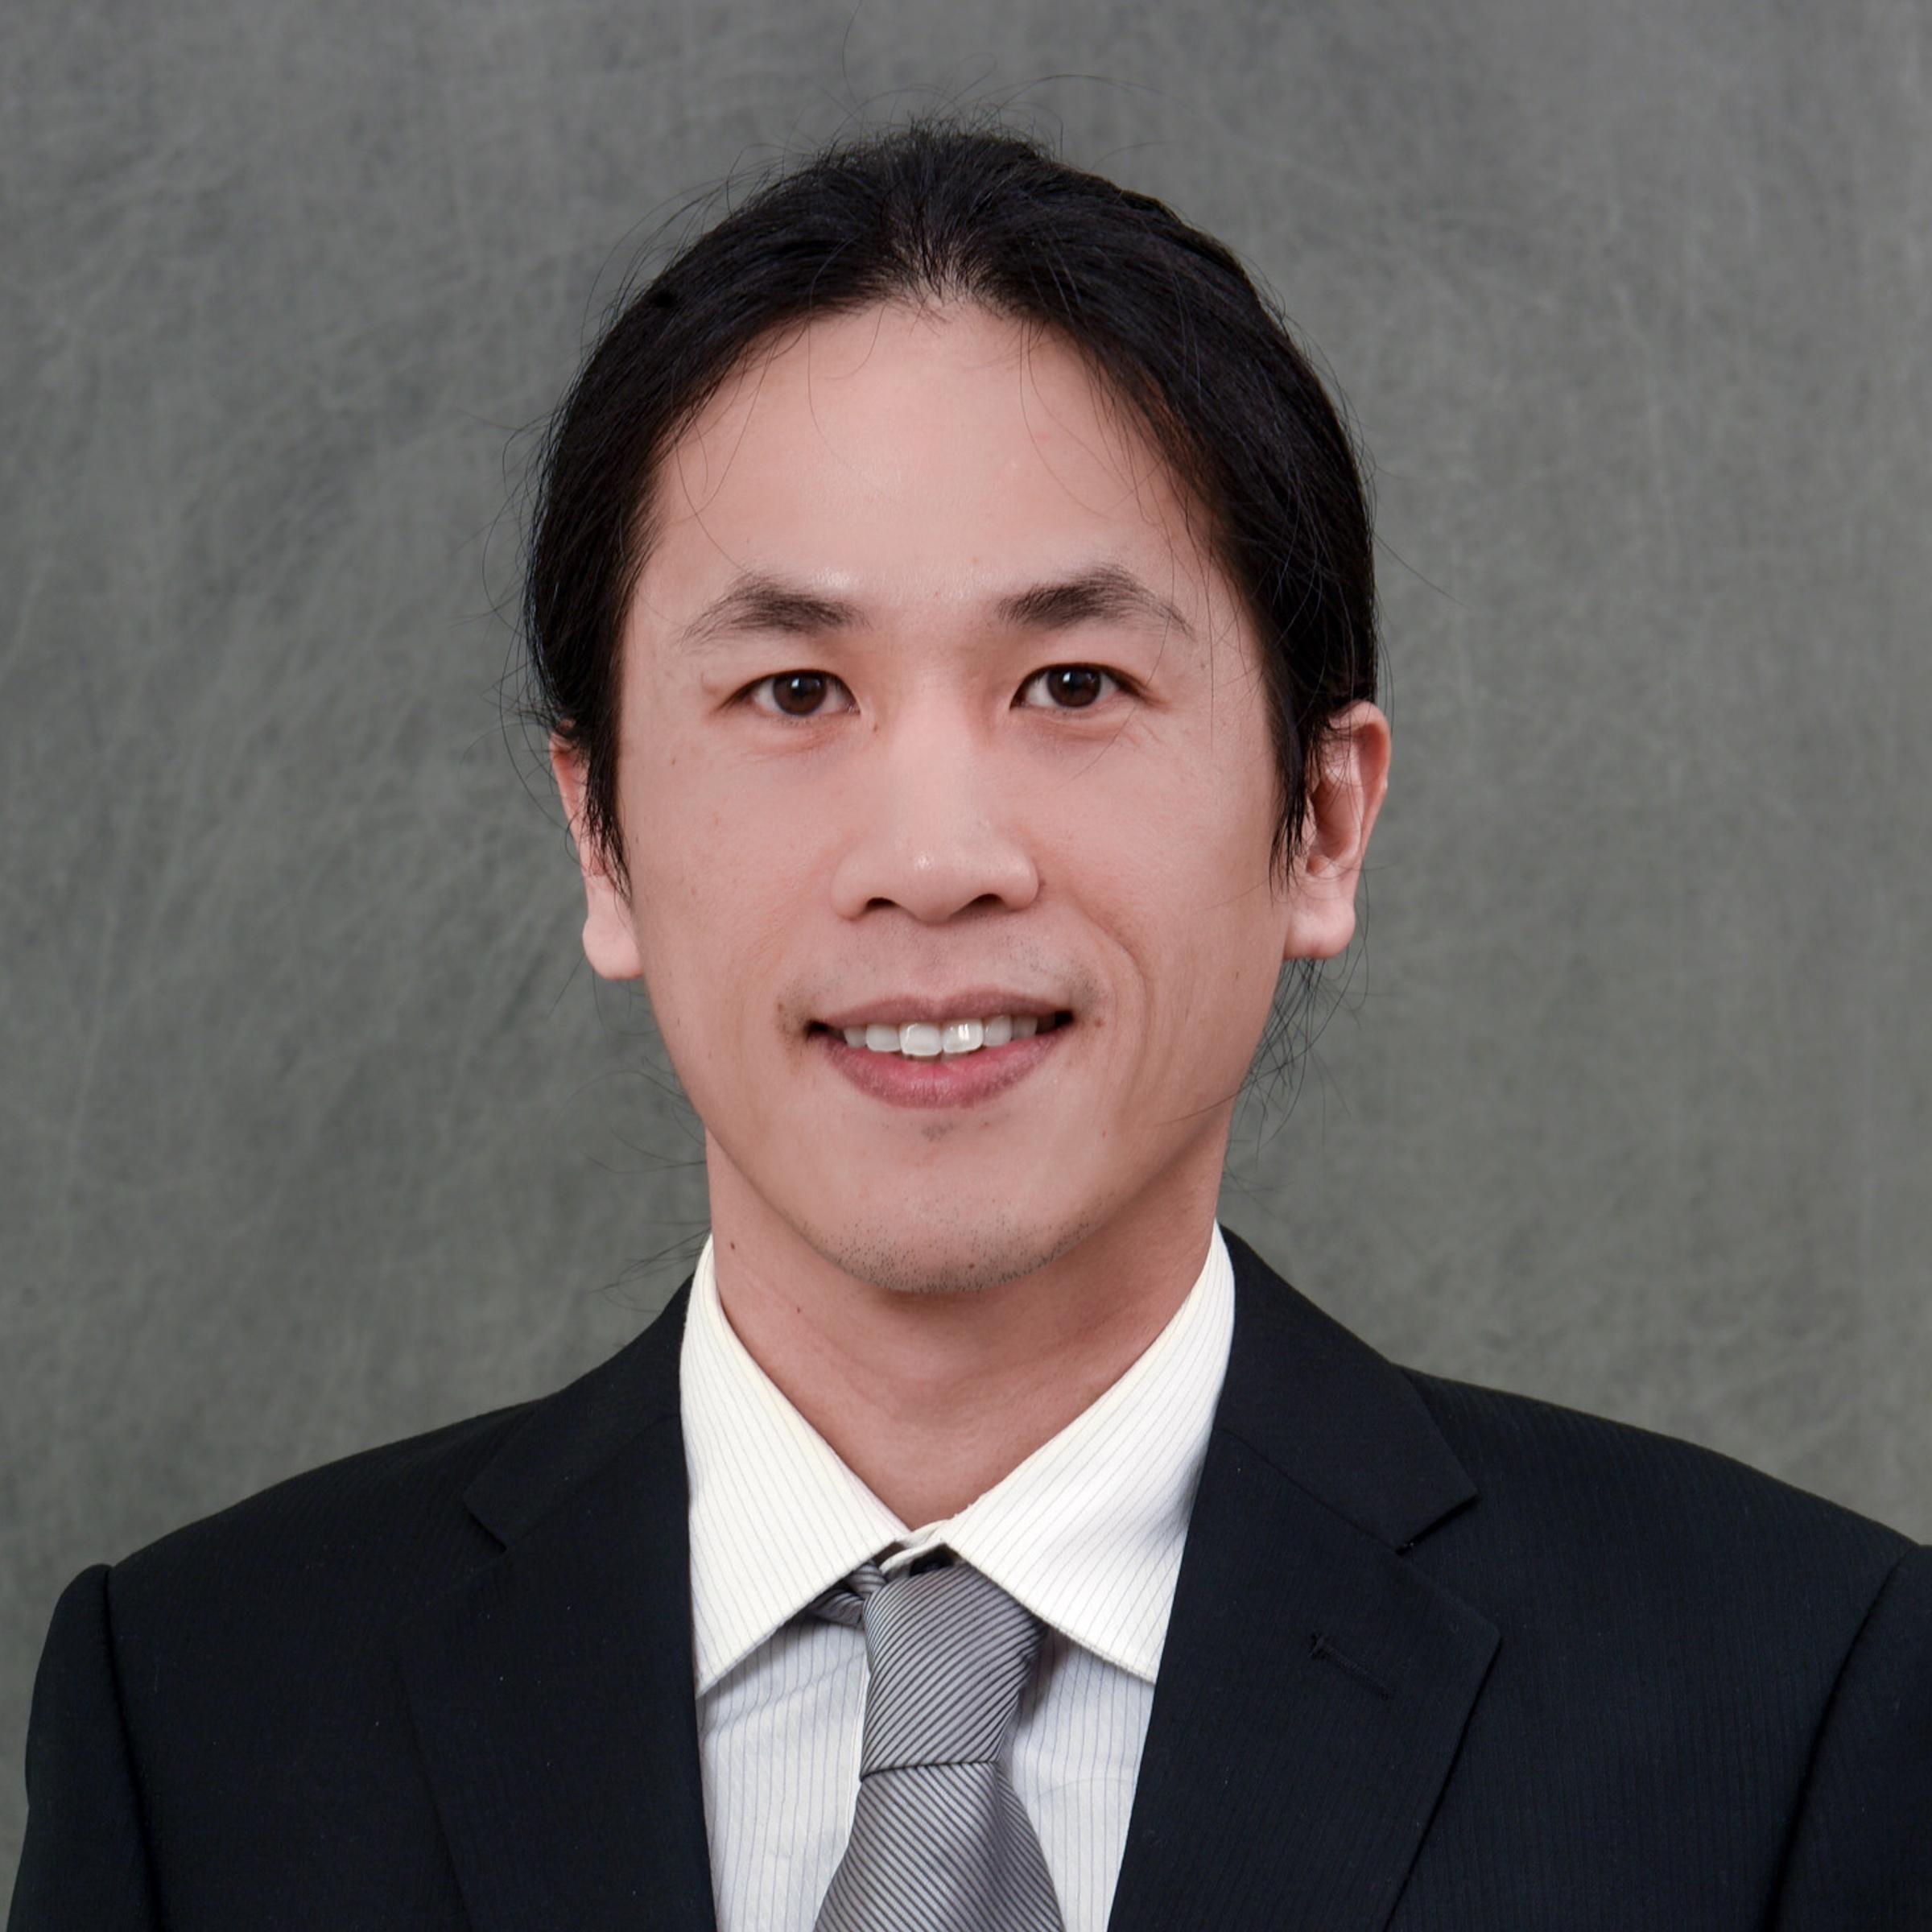 Ching-Chang Chung